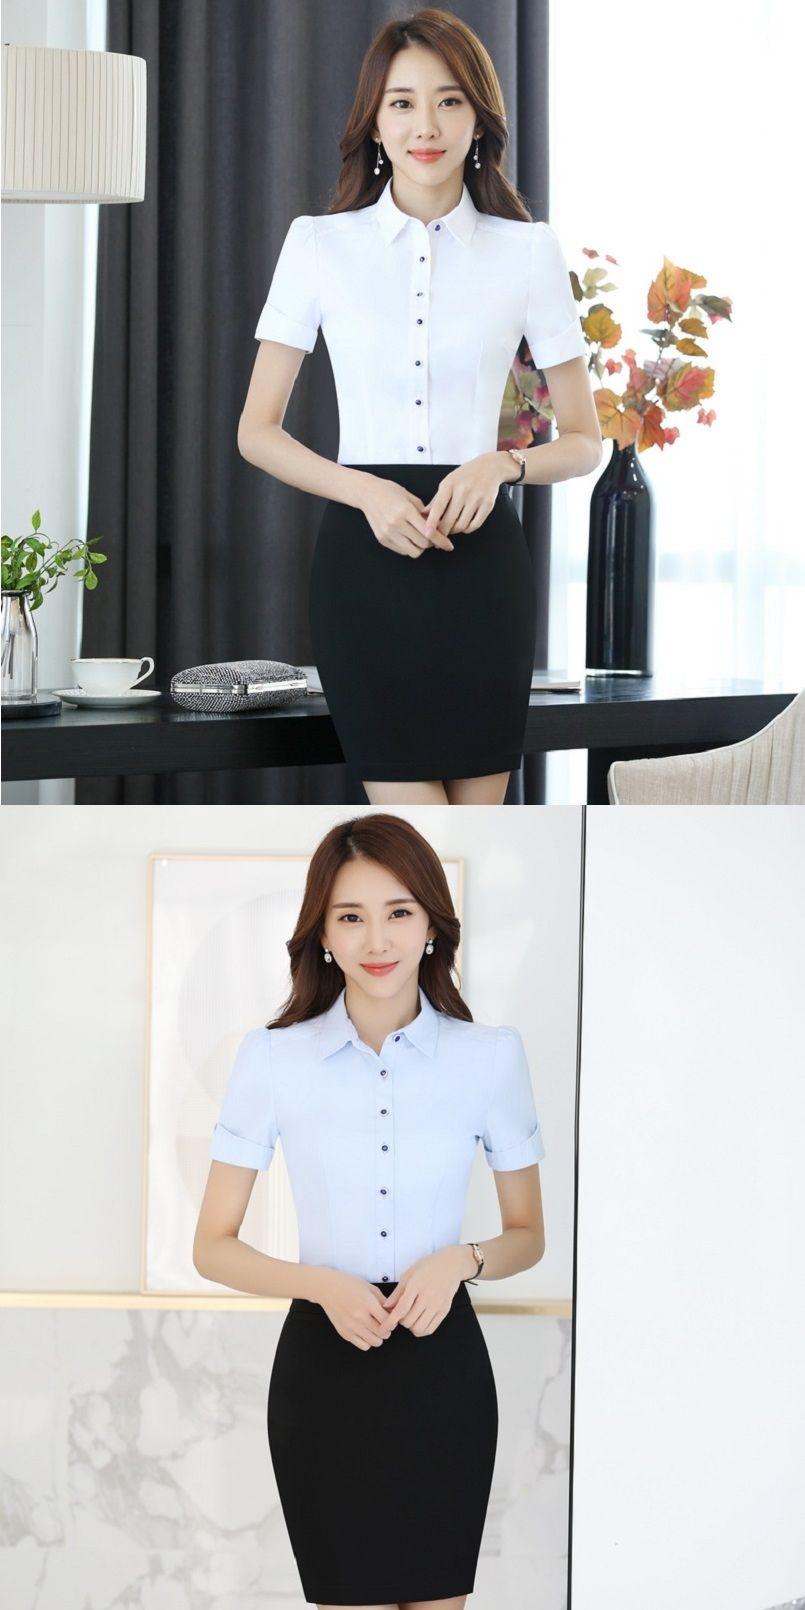 4663187c518fb Ladies Office Short Sleeve Shirts - BCD Tofu House